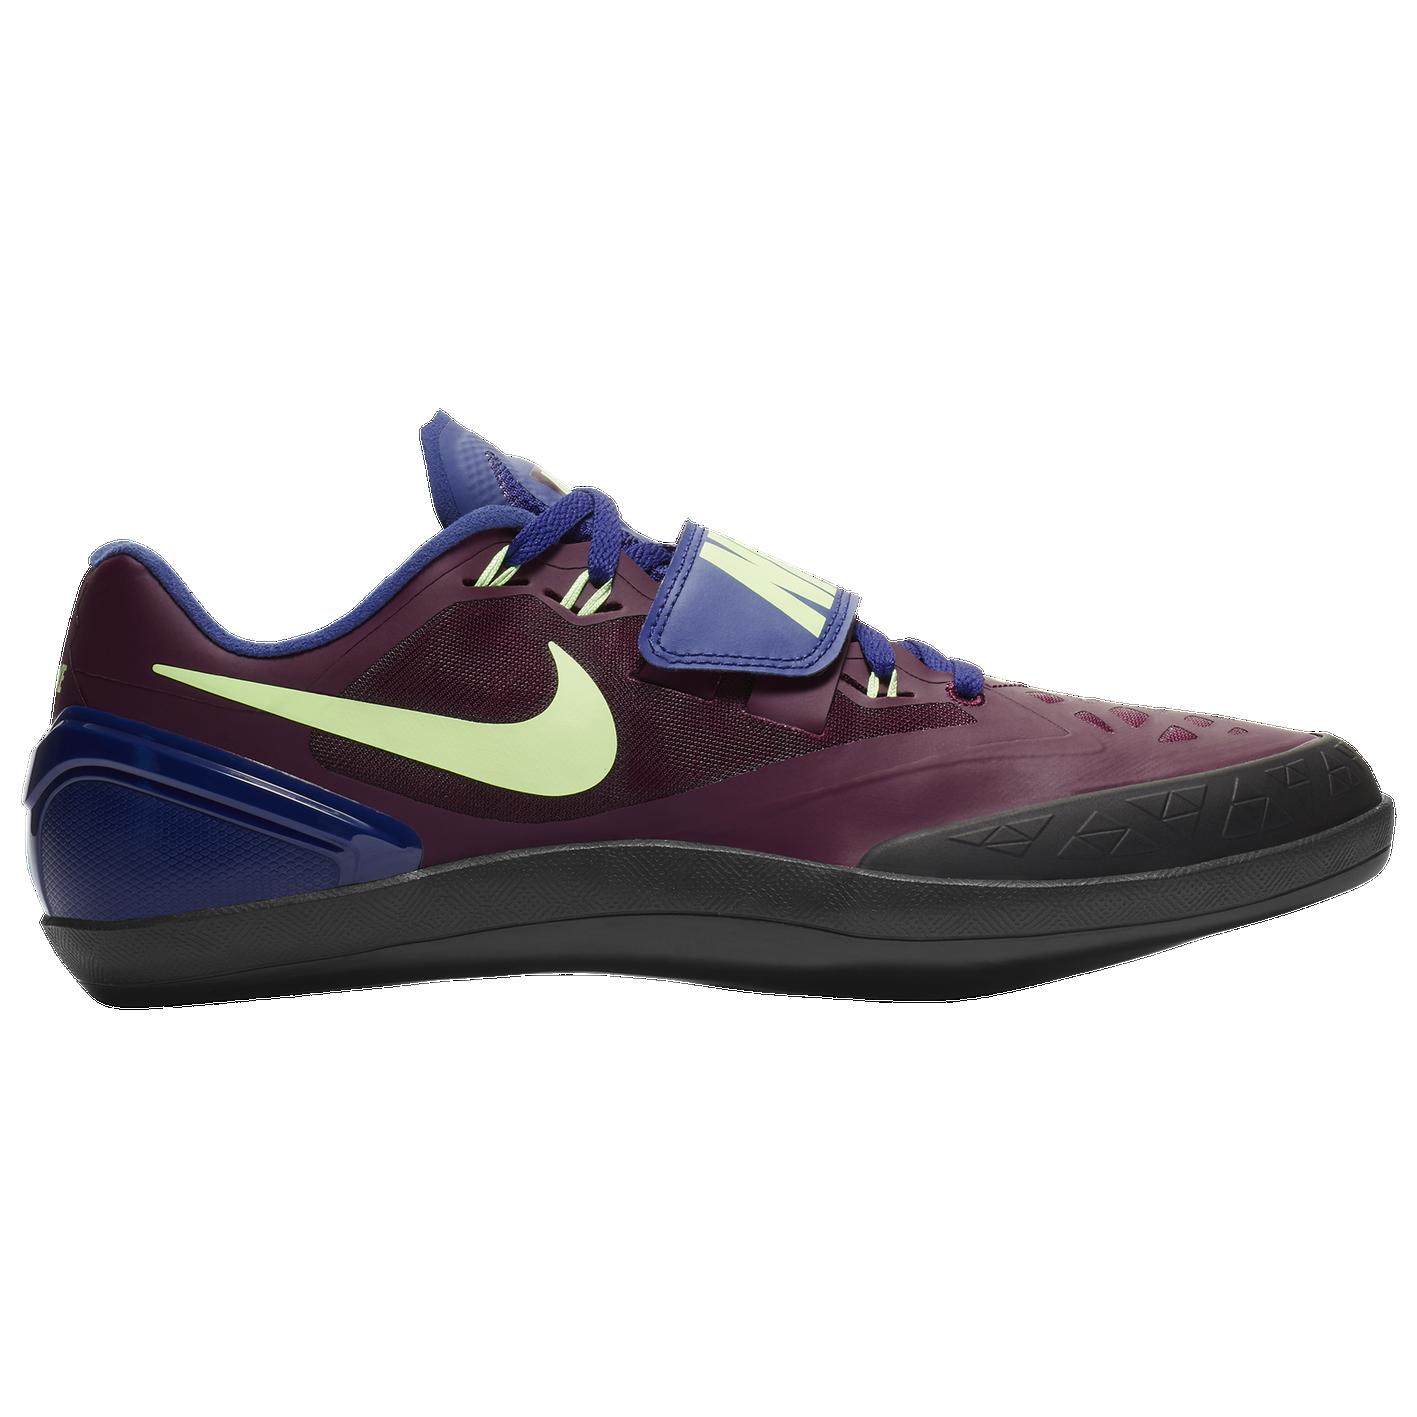 Nike Zoom Rotational 6 - Men s - Track   Field - Shoes - Bordeaux ... 1cf76bbfe